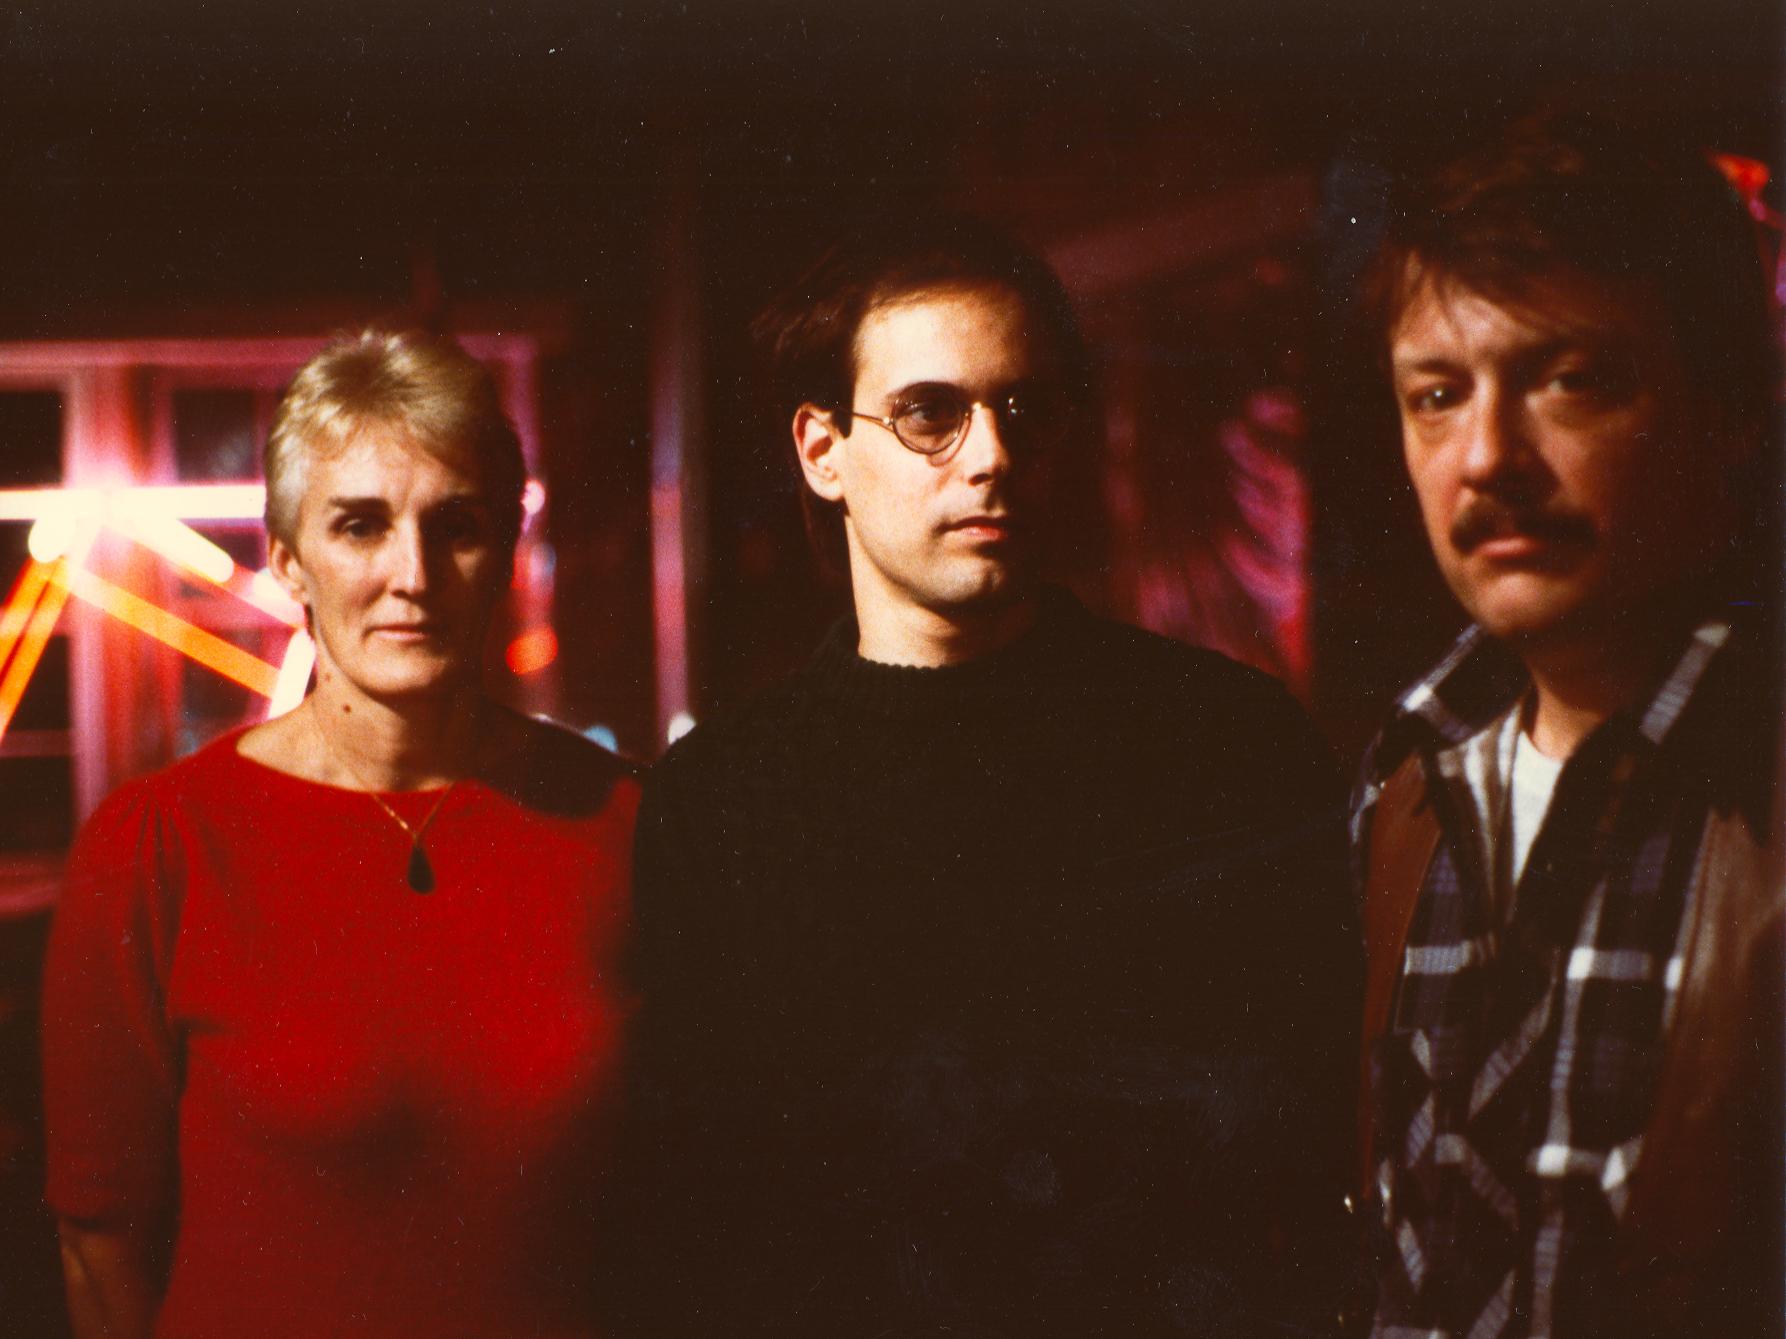 3 collaborators portrait